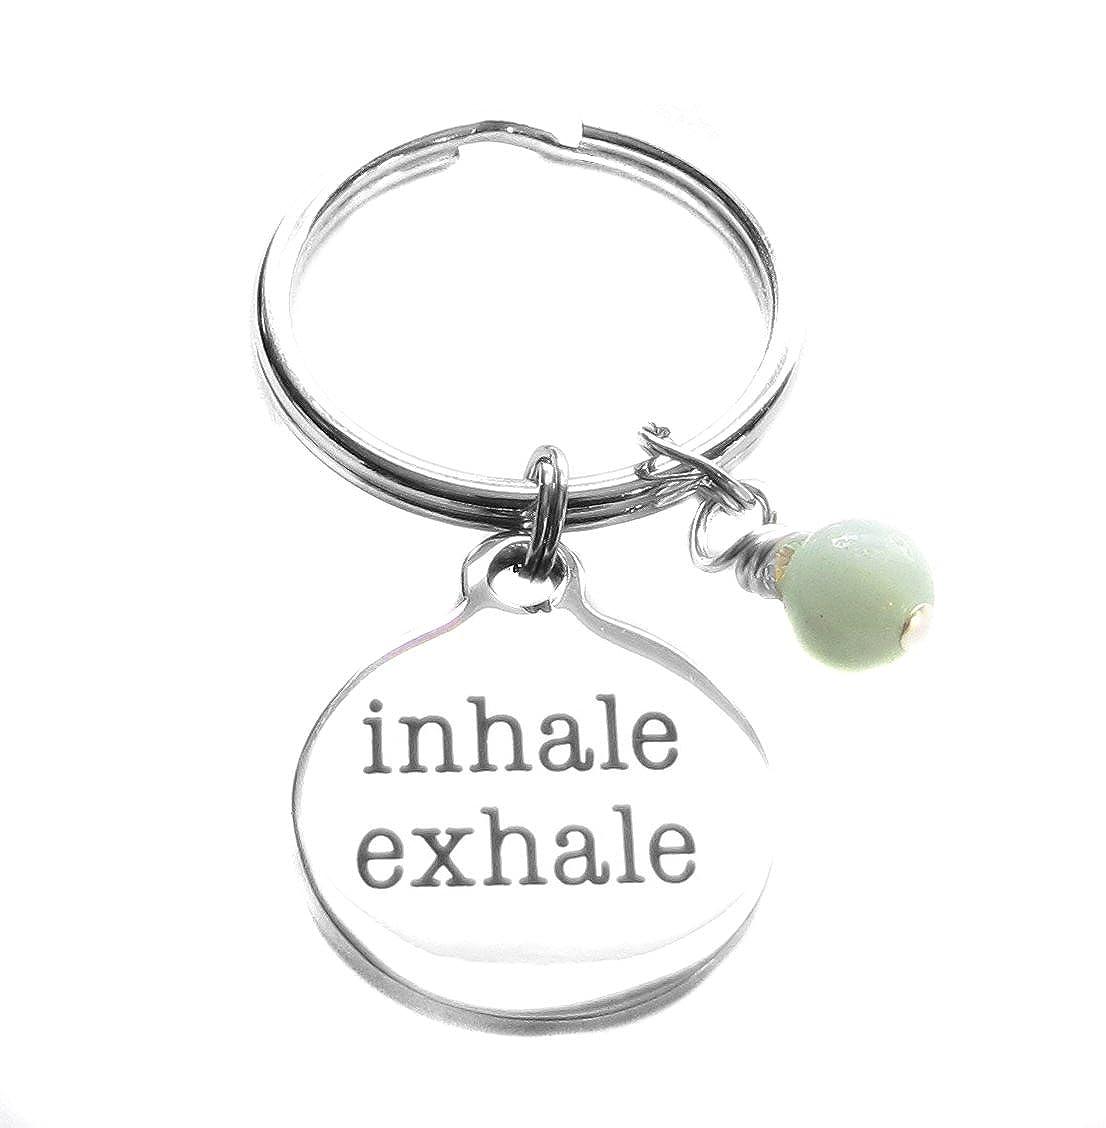 inhale exhale (吸って吐いて) ヨガ レイキ 呼吸法 喉 第5チャクラ キーチェーン   B06XBF3D64